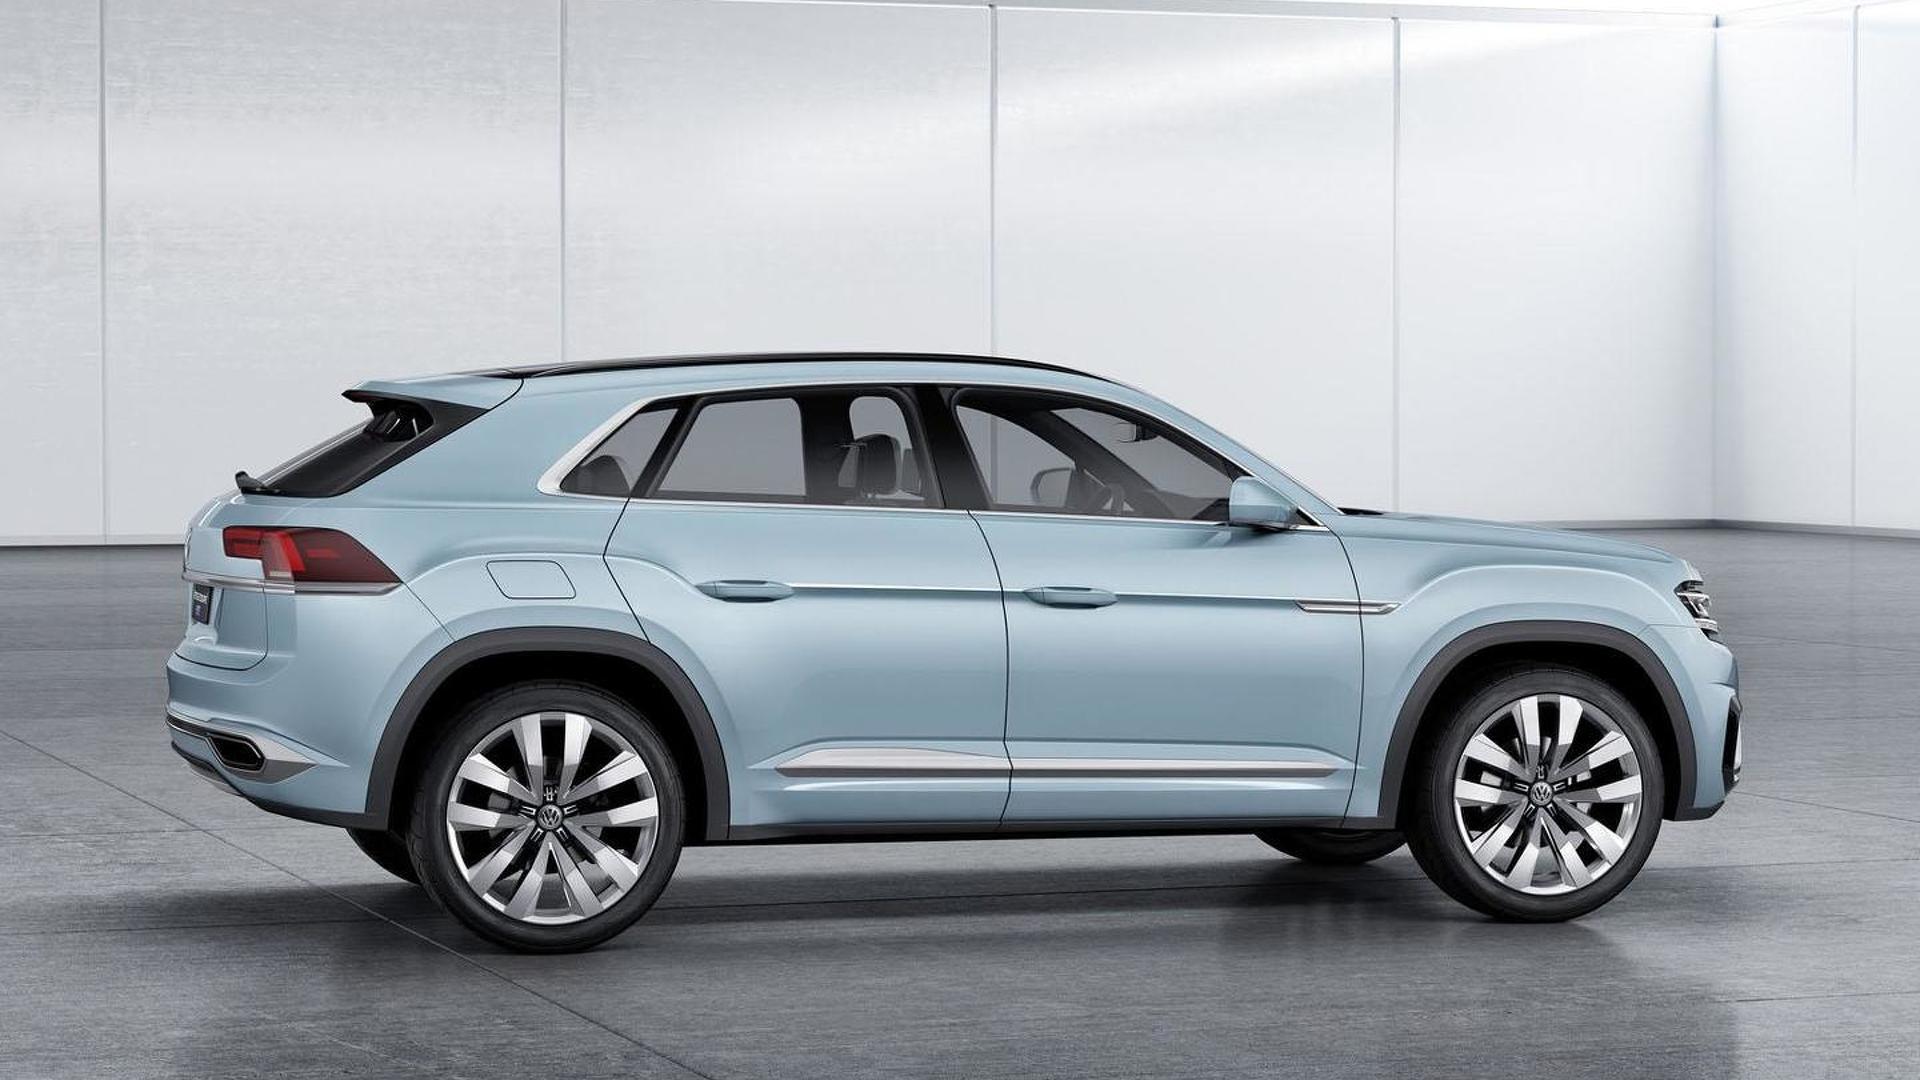 Новый кроссовер Volkswagen Cross Coupe GTE